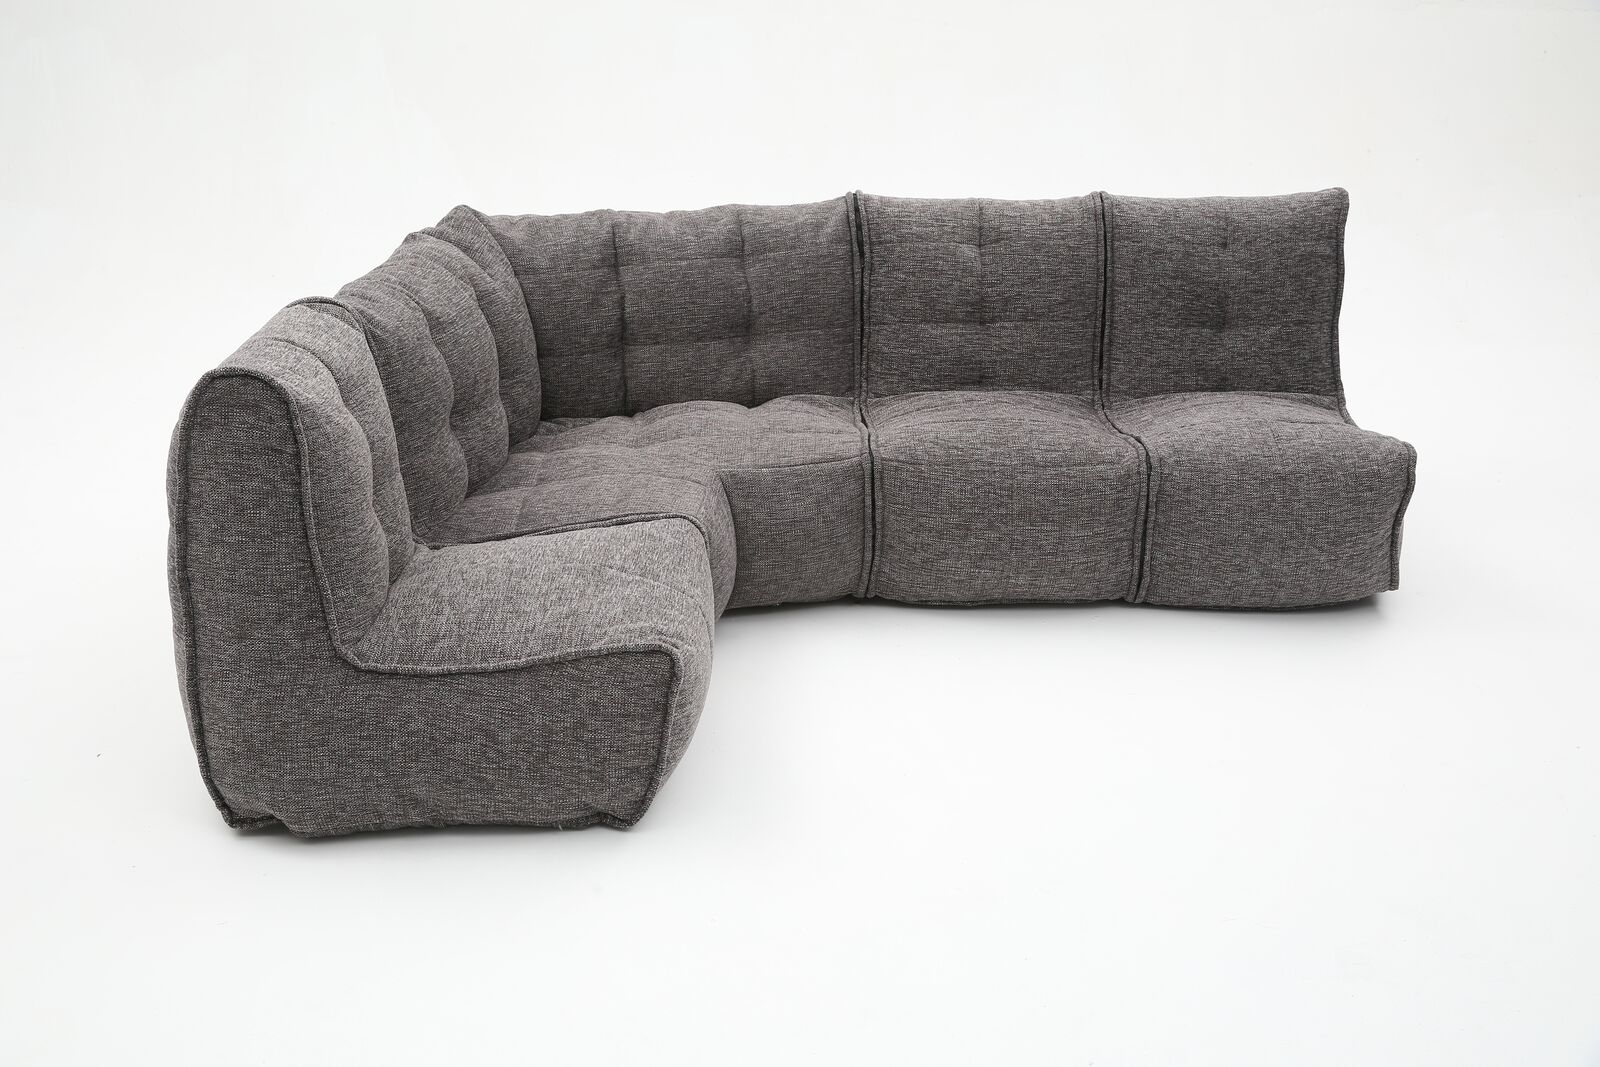 Преимущества модульного дивана